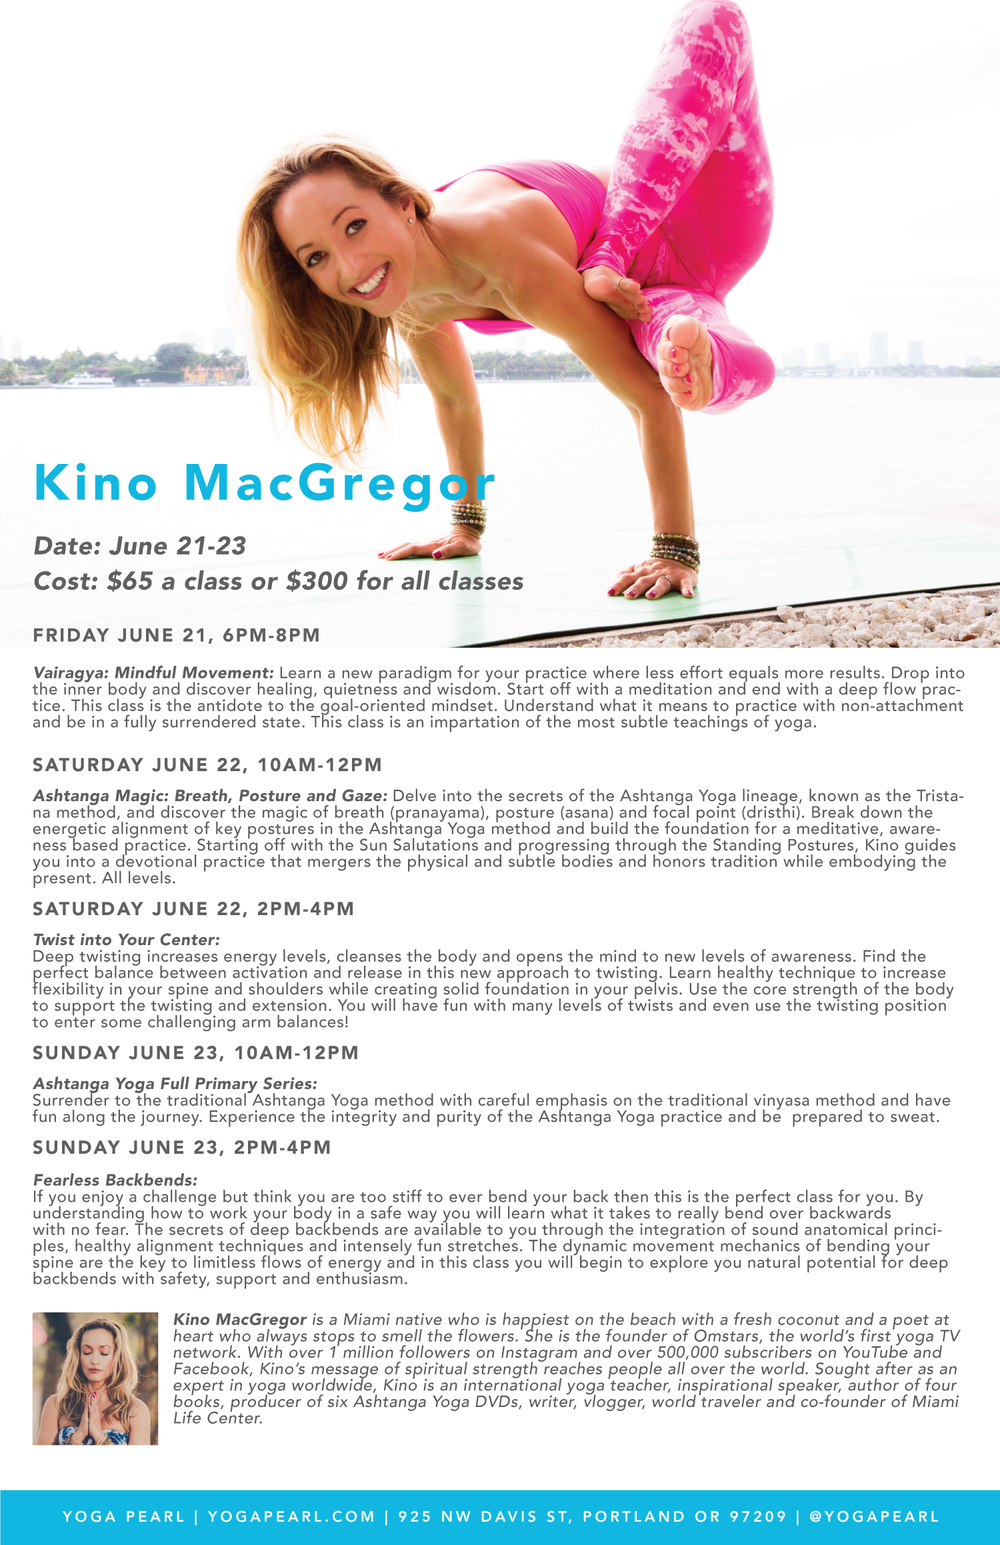 kino_macgregor_portland_yoga.png